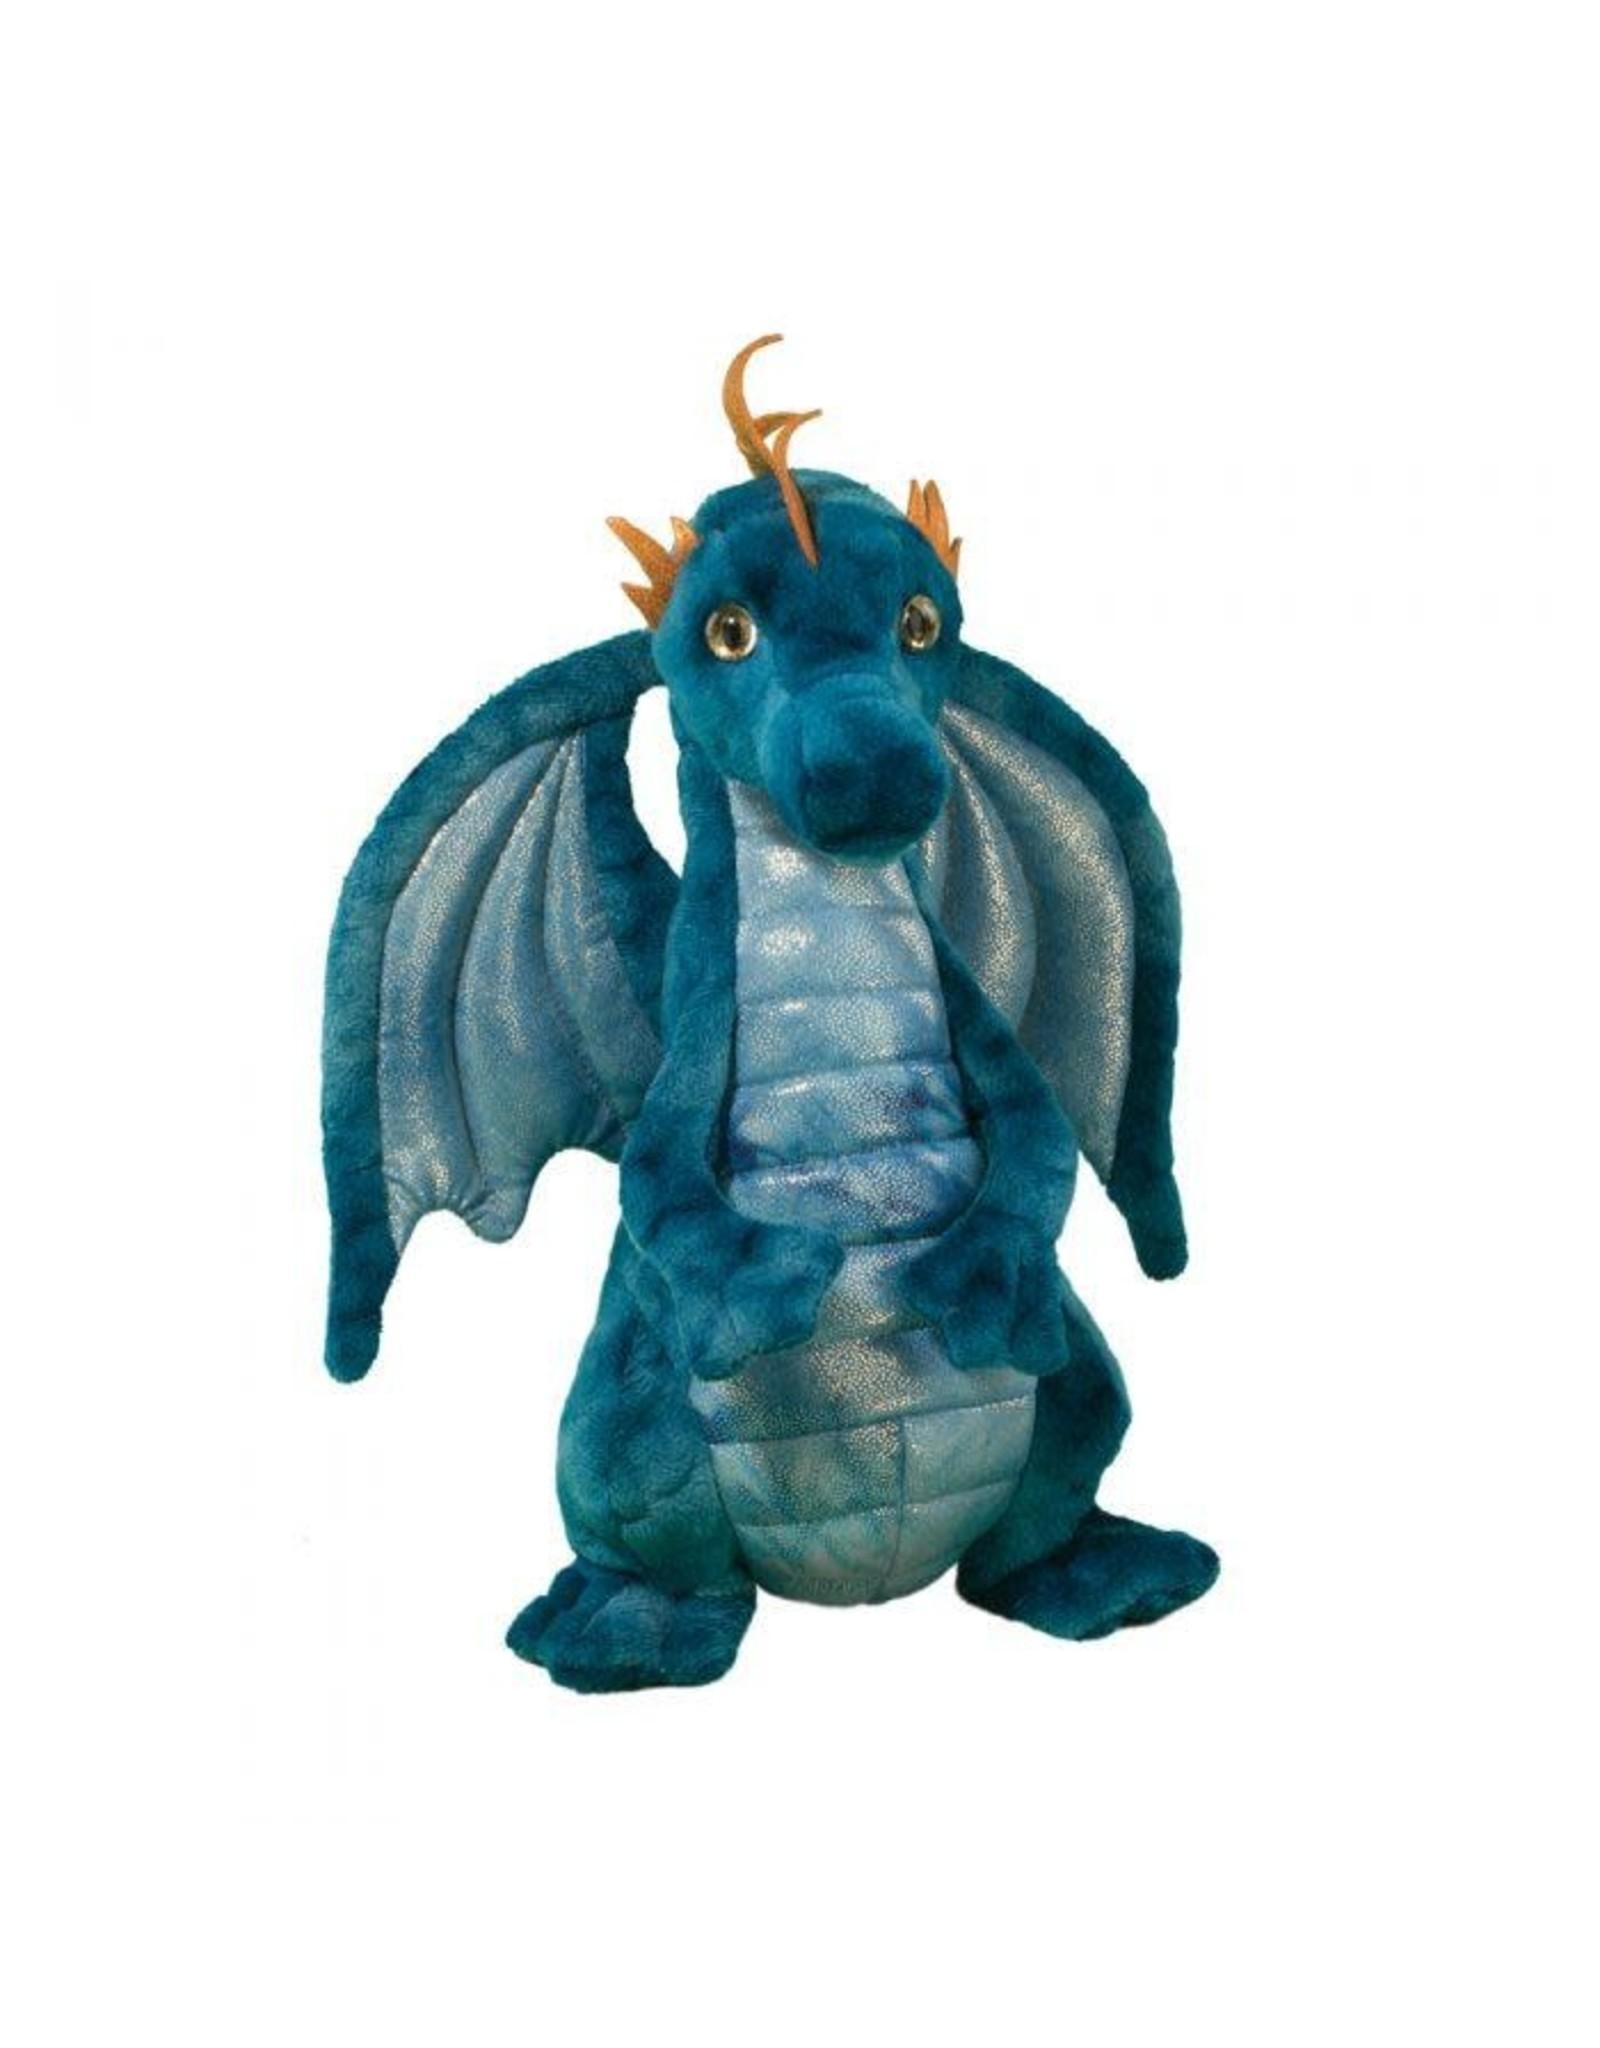 Blue Dragon - Zander